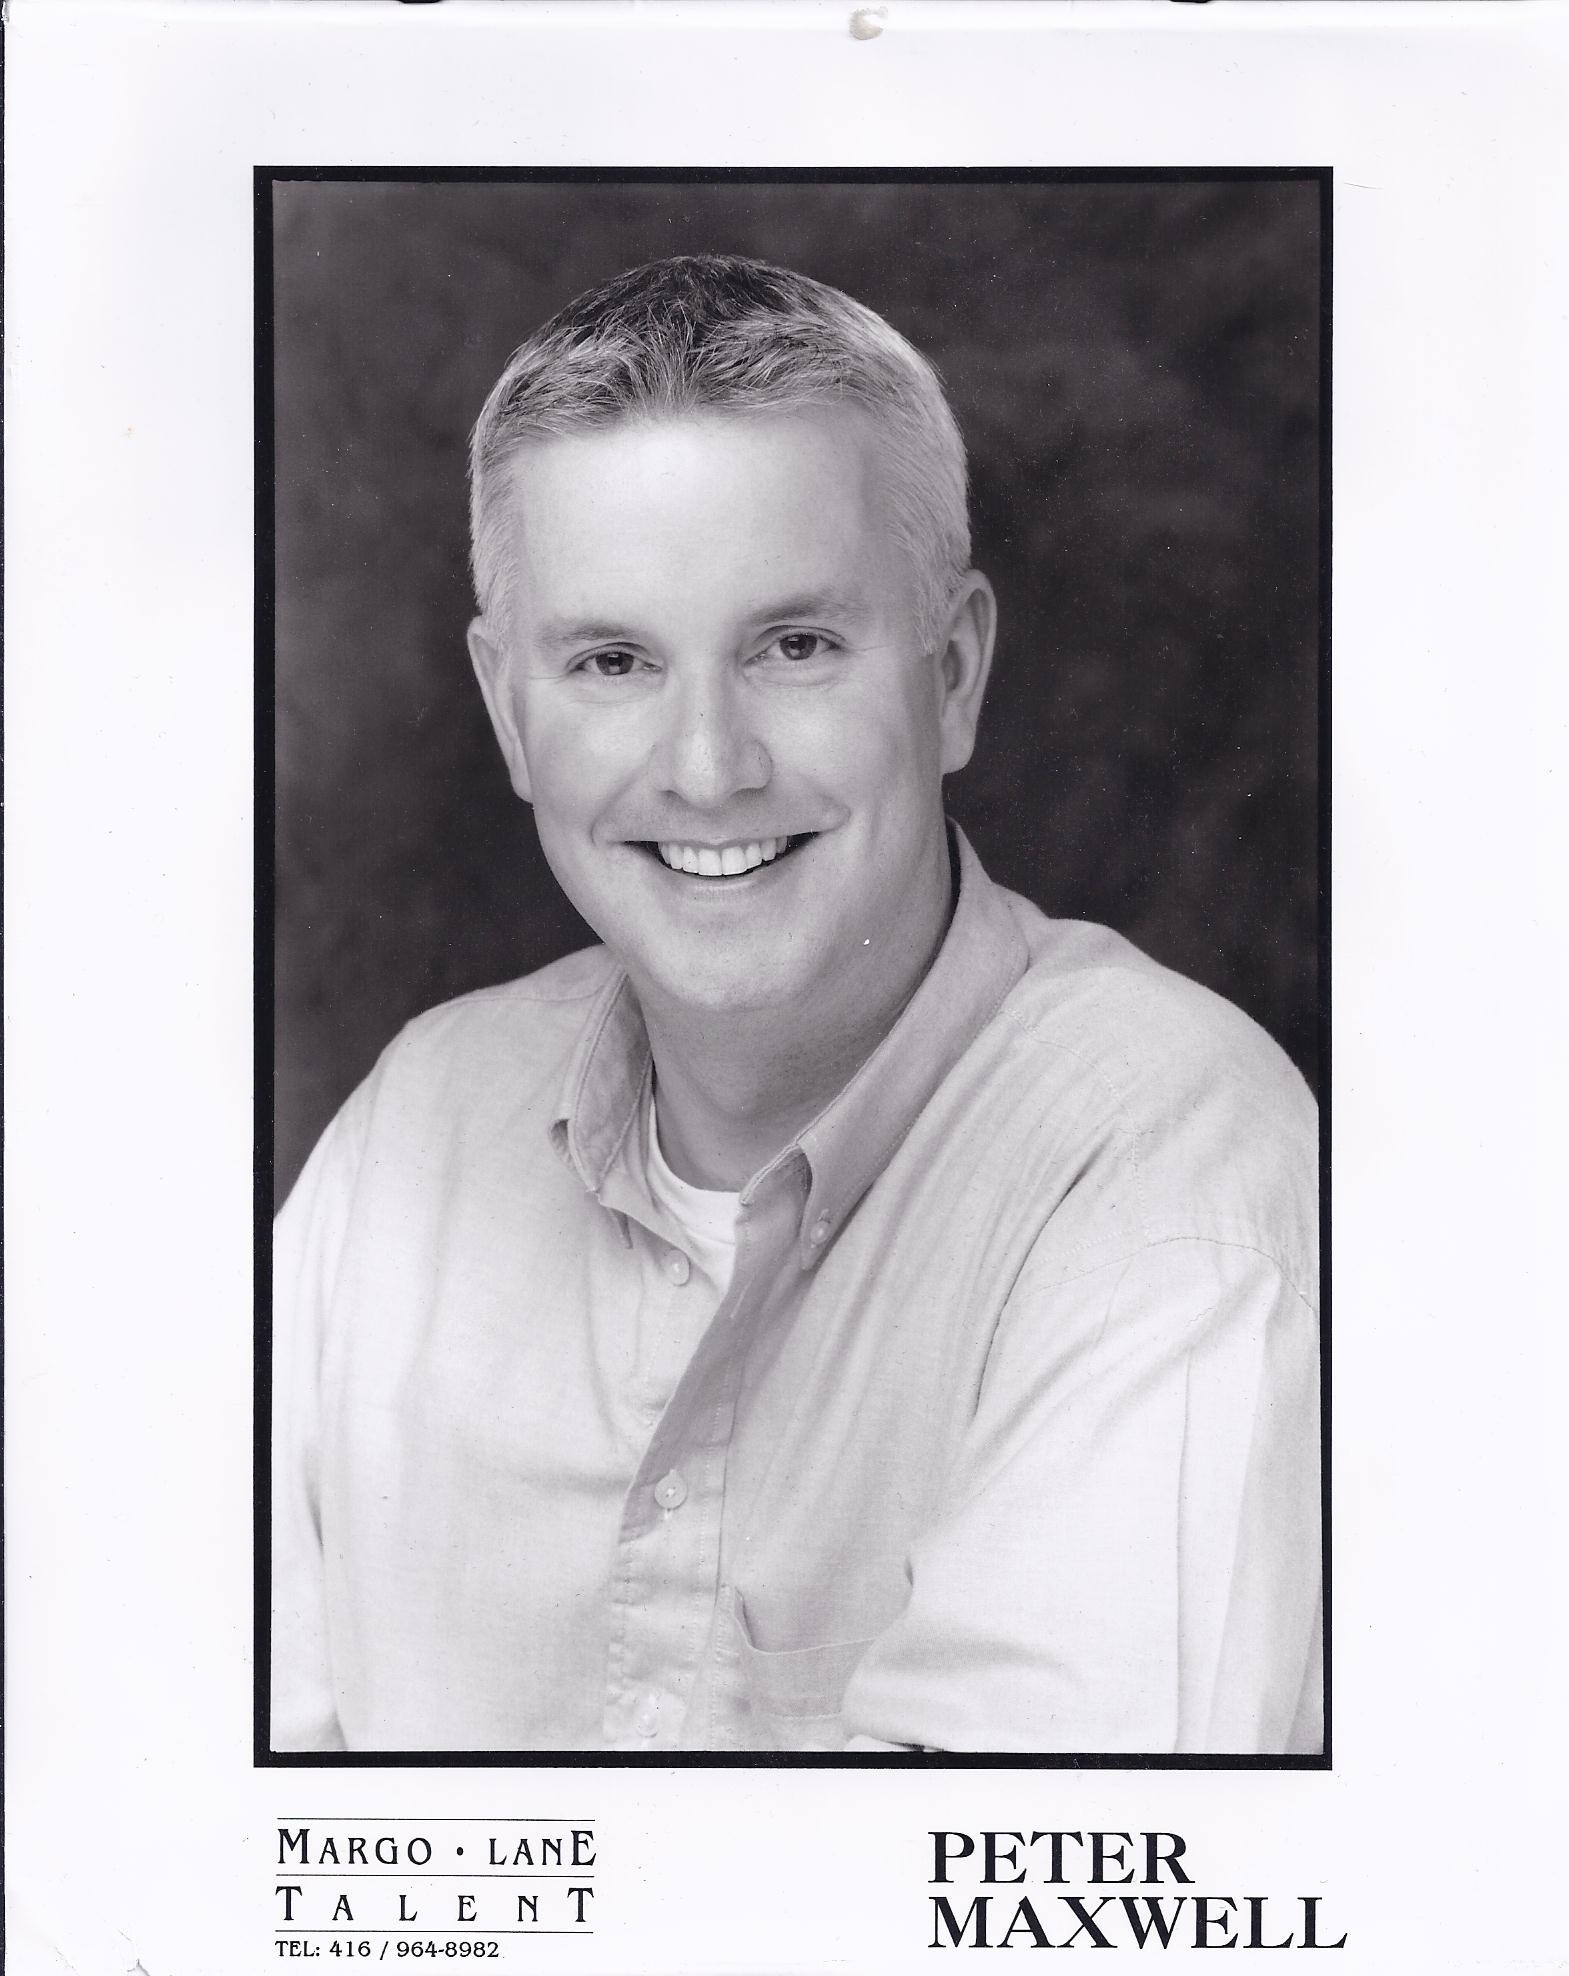 Peter Maxwell